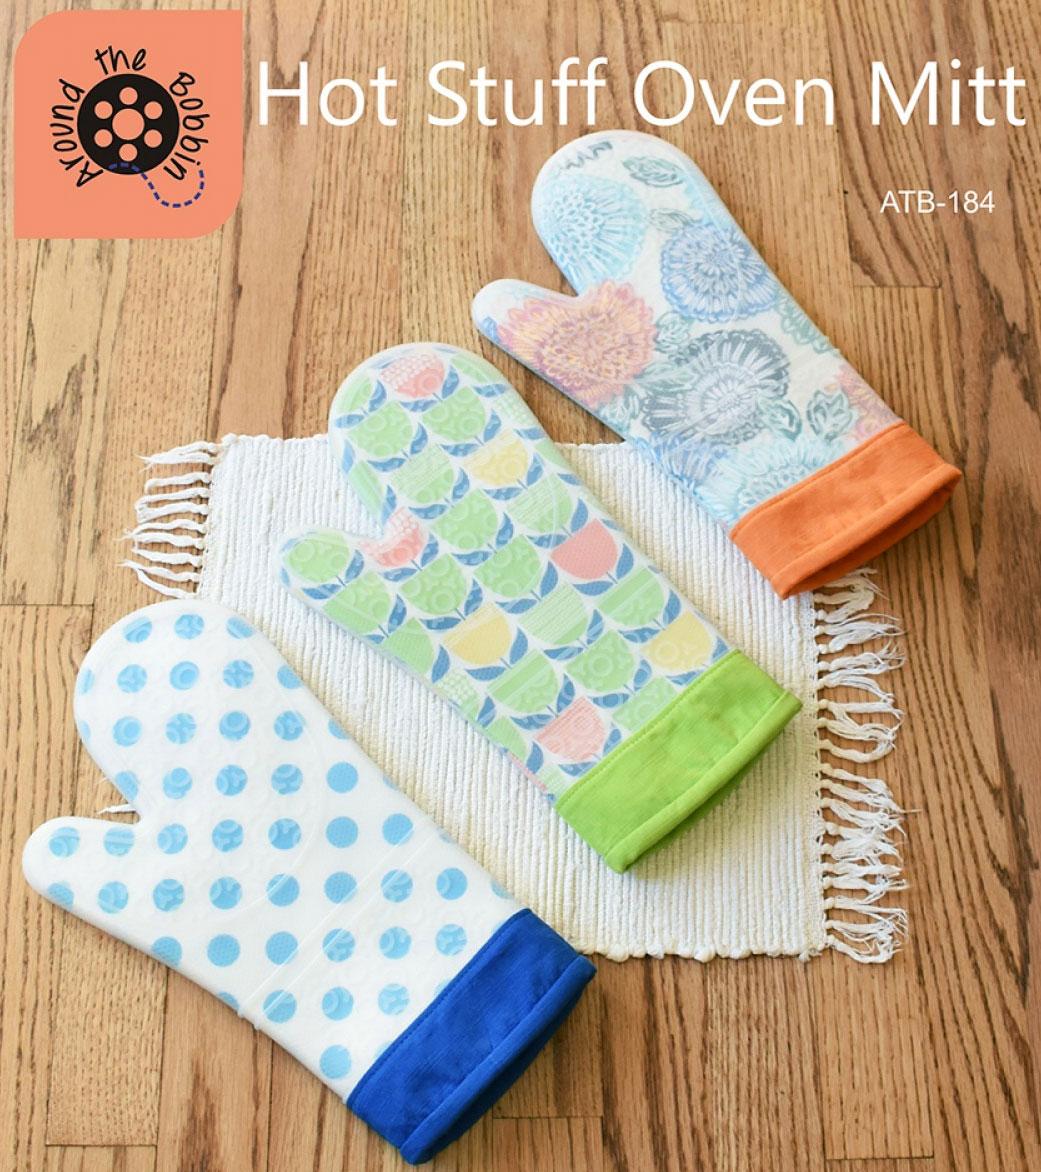 Hot-Stuff-Oven-Mitt-sewing-pattern-Around-The-Bobbin-1